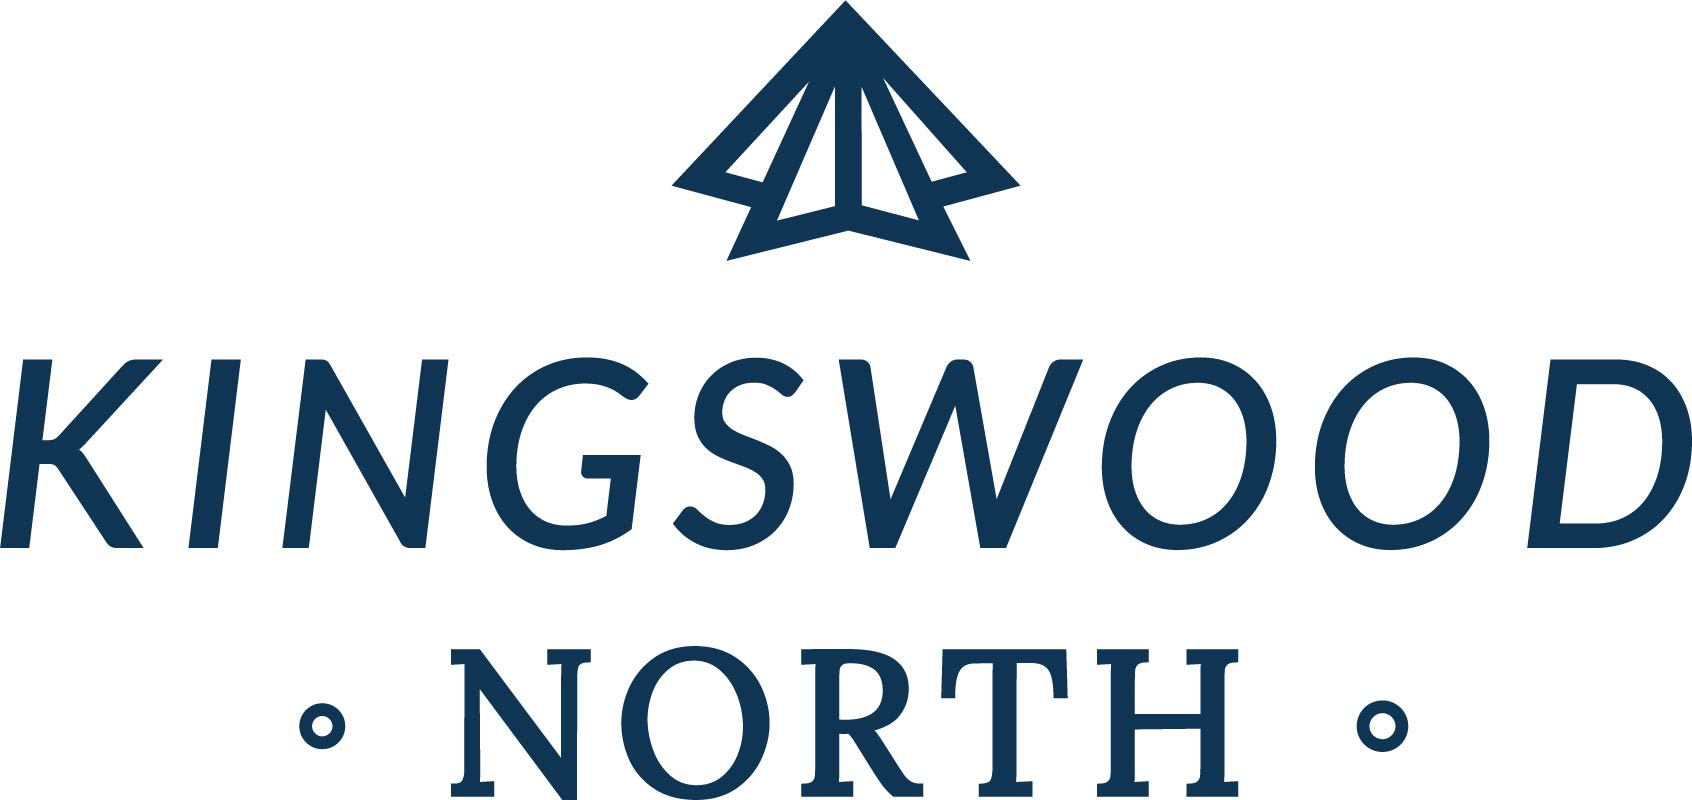 Kingswood North_Logo.jpg